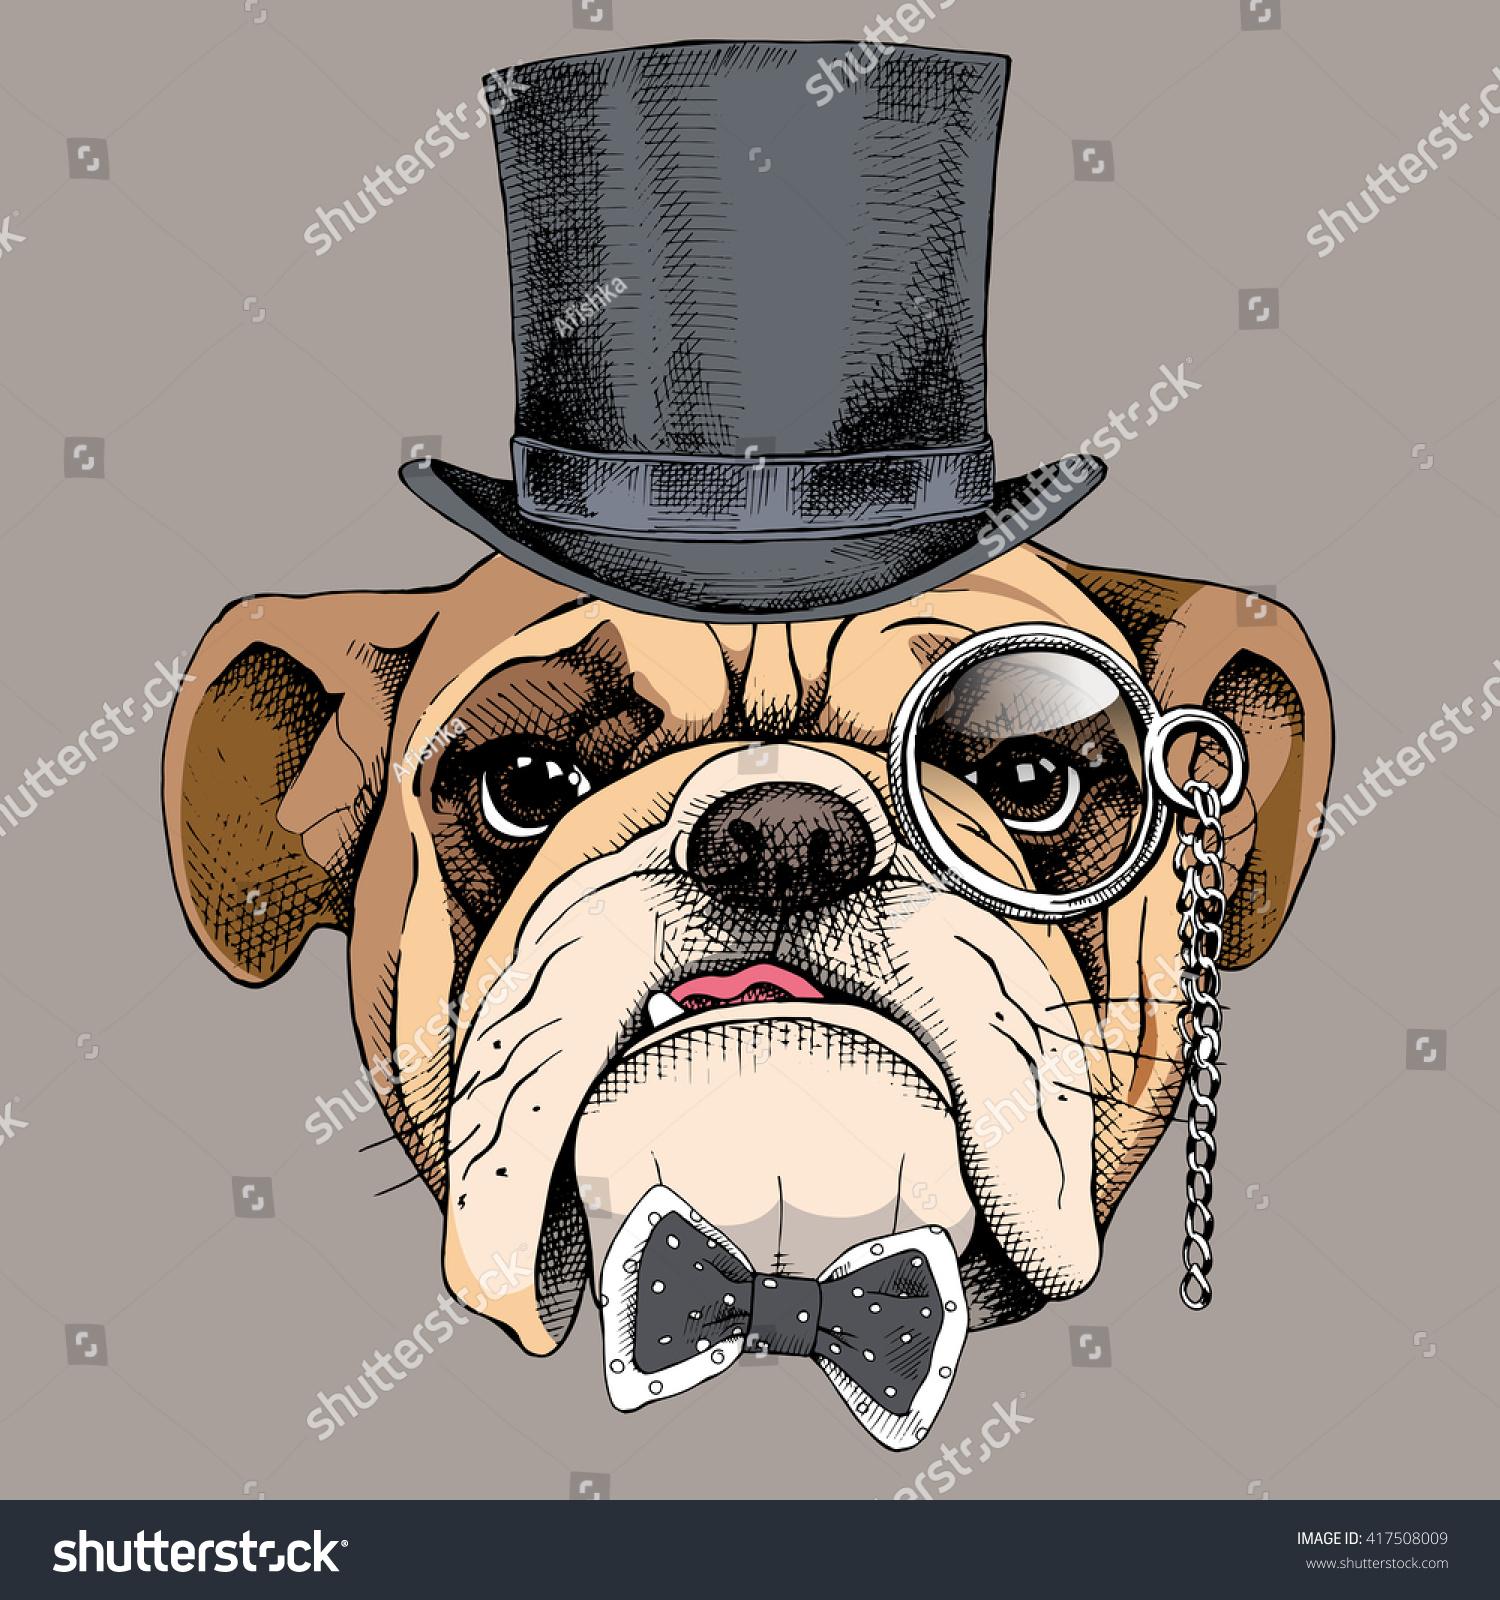 a68c33f9329 Bulldog Portrait Bowler Hat Tie Monocle Stock Vector (Royalty Free ...